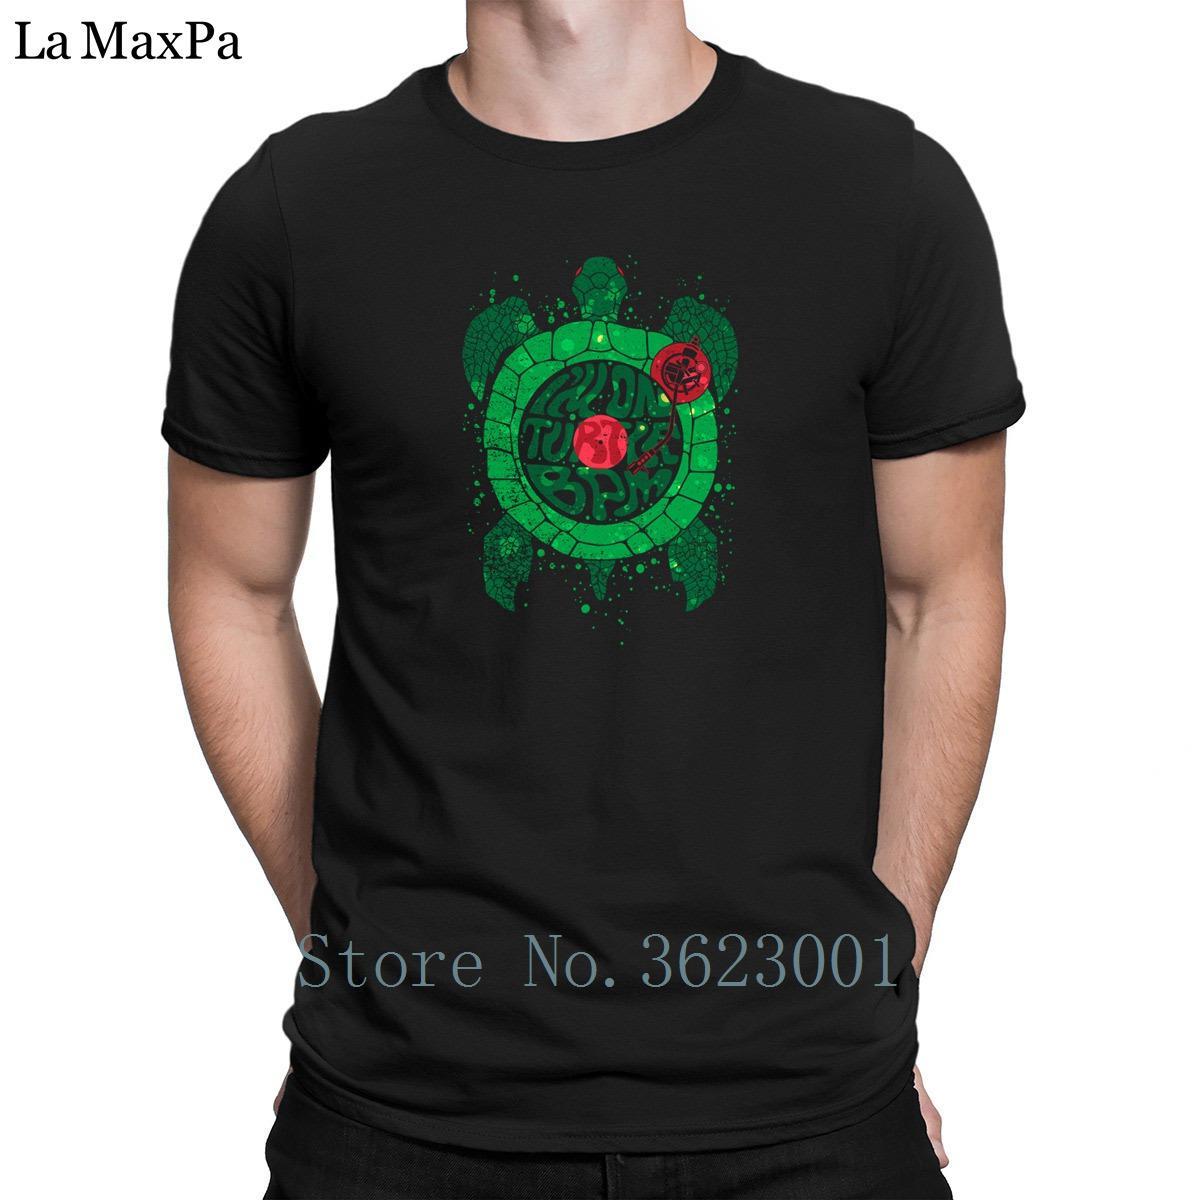 Creature S-3xl T-Shirt On Turtle Bpm Men's T Shirt Fun Spring Autumn Tee  Shirt Man Hiphop Top Tee Shirt Man Pictures Building